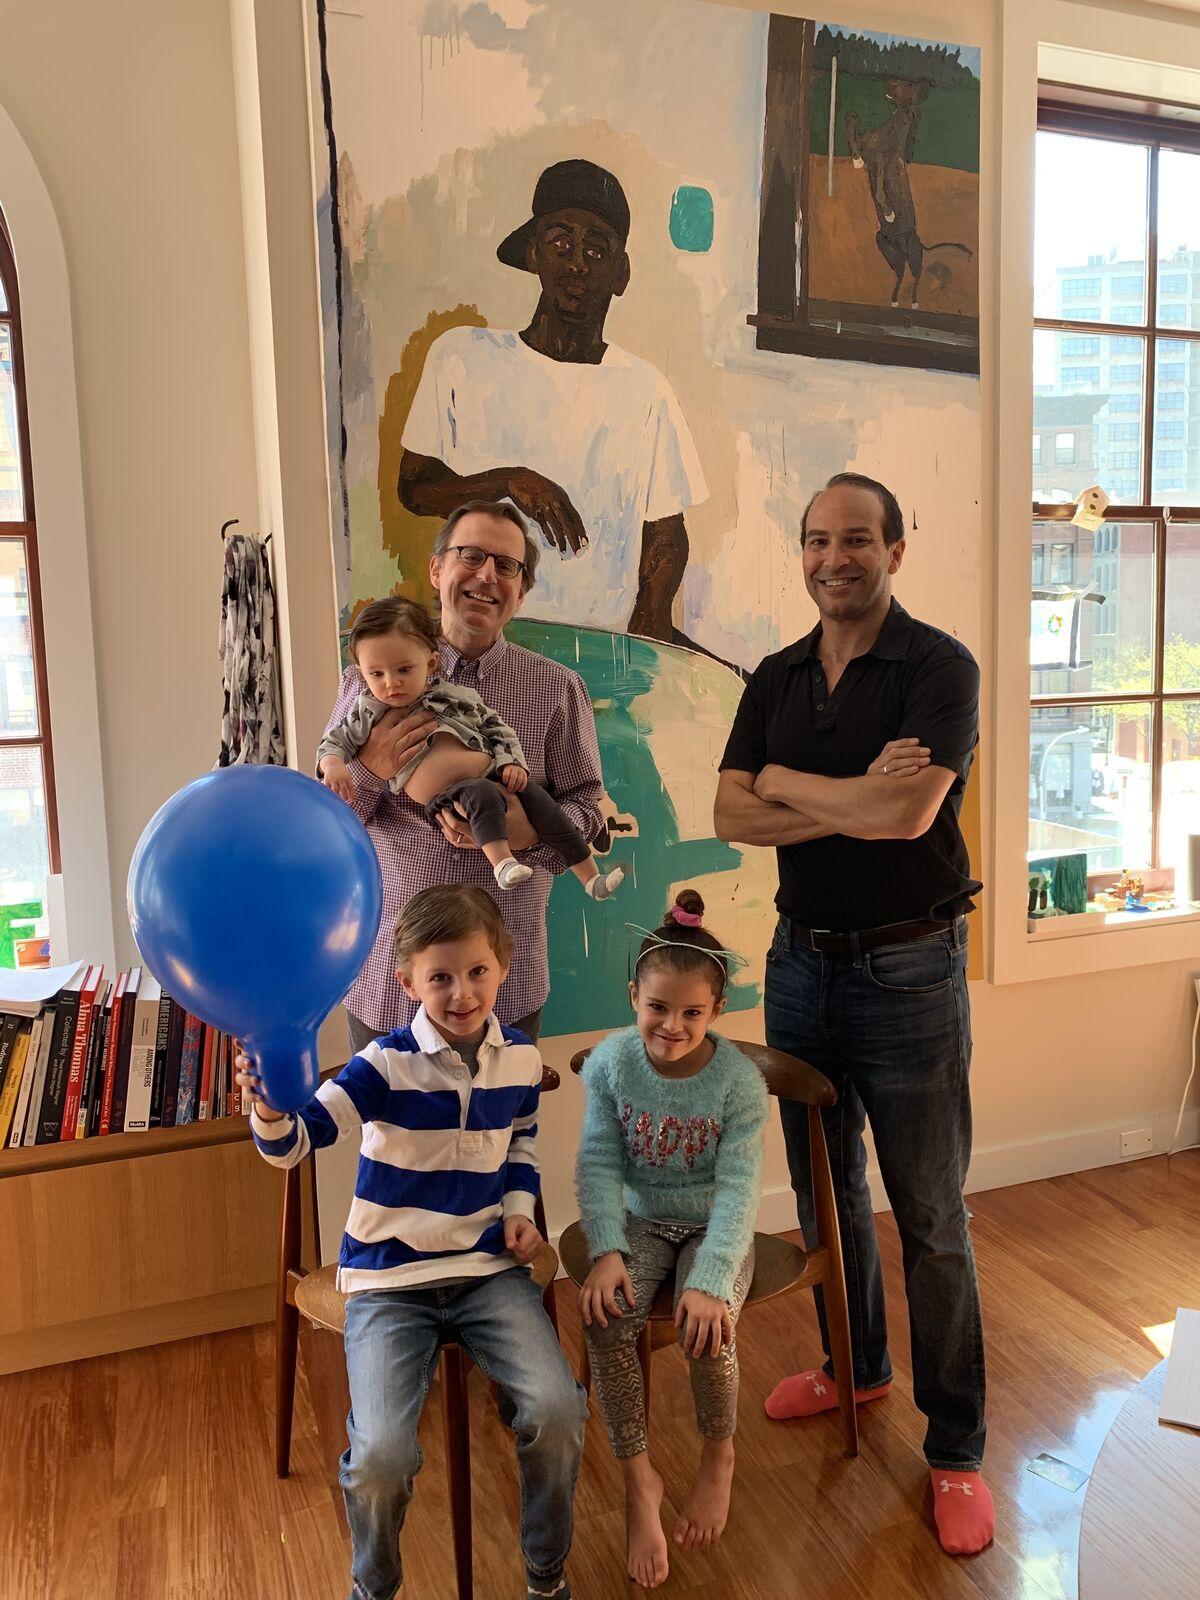 Bernard Lumpkin, Carmine Boccuzzi, and their children with Henry Taylor, The Sweet William Rorex Jr., 2010. Courtesy of Bernard Lumpkin.